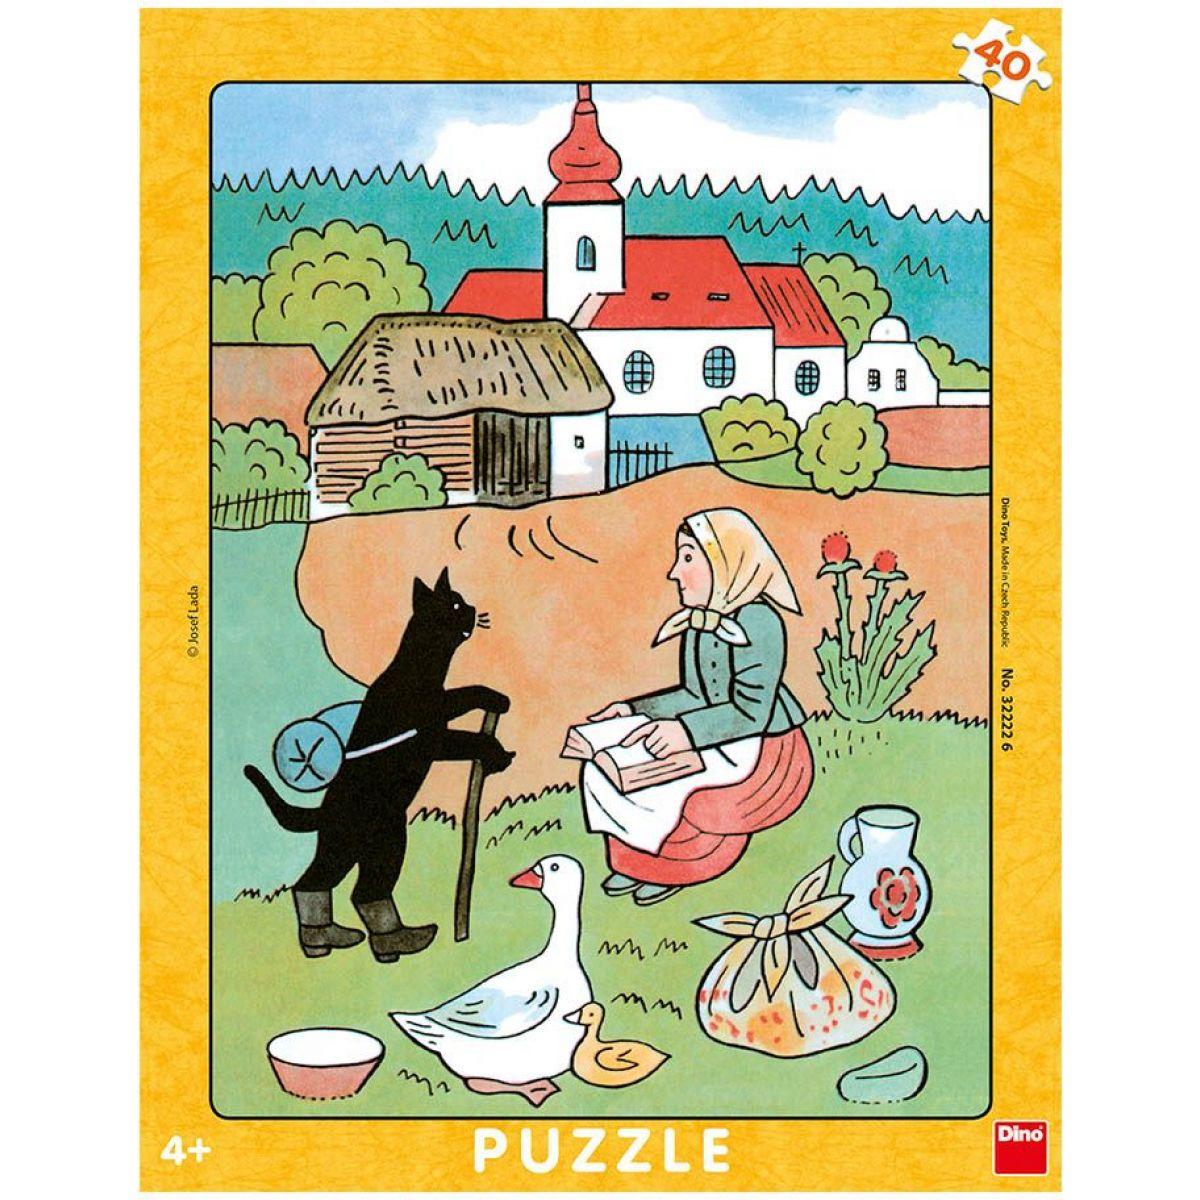 Dino Josef Lada Mikeš Na Vandru deskové puzzle 40 dílků